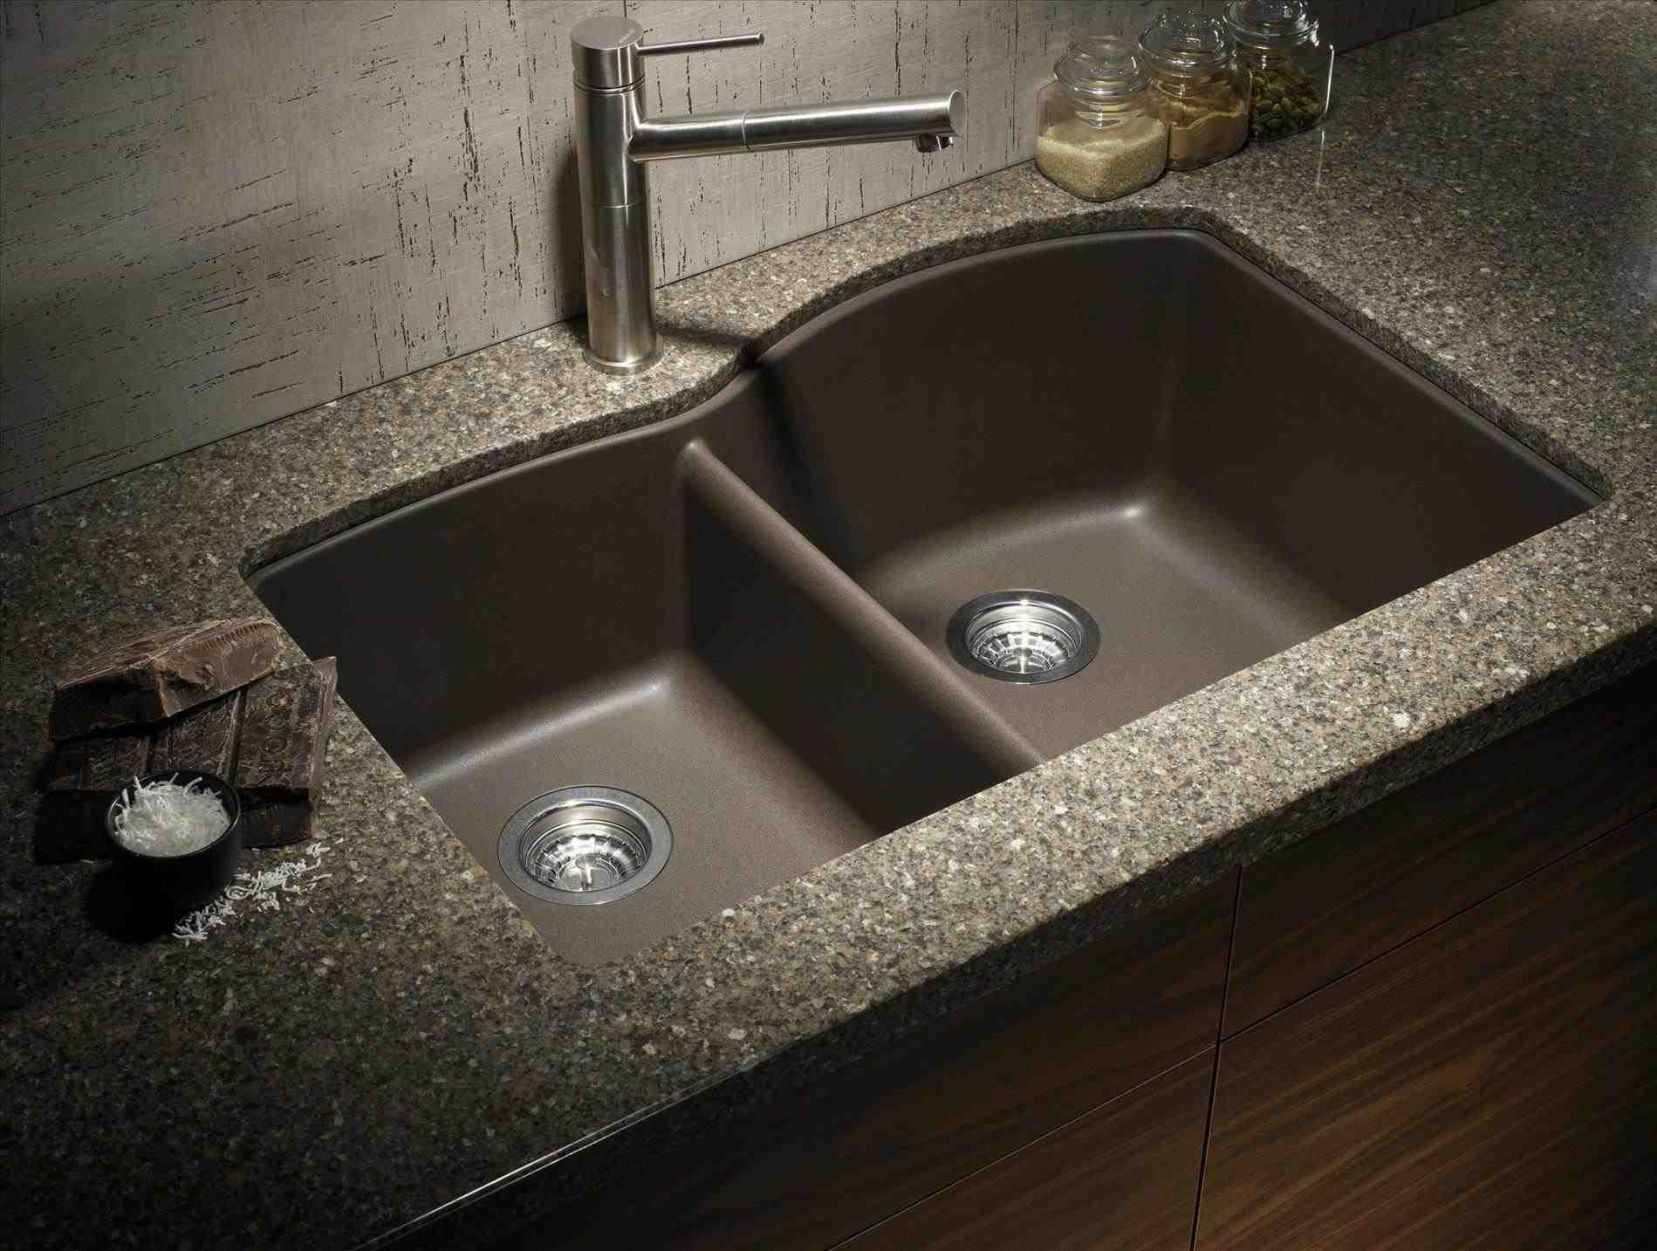 70 Granite Countertop Protector Mats Kitchen Design And Layout